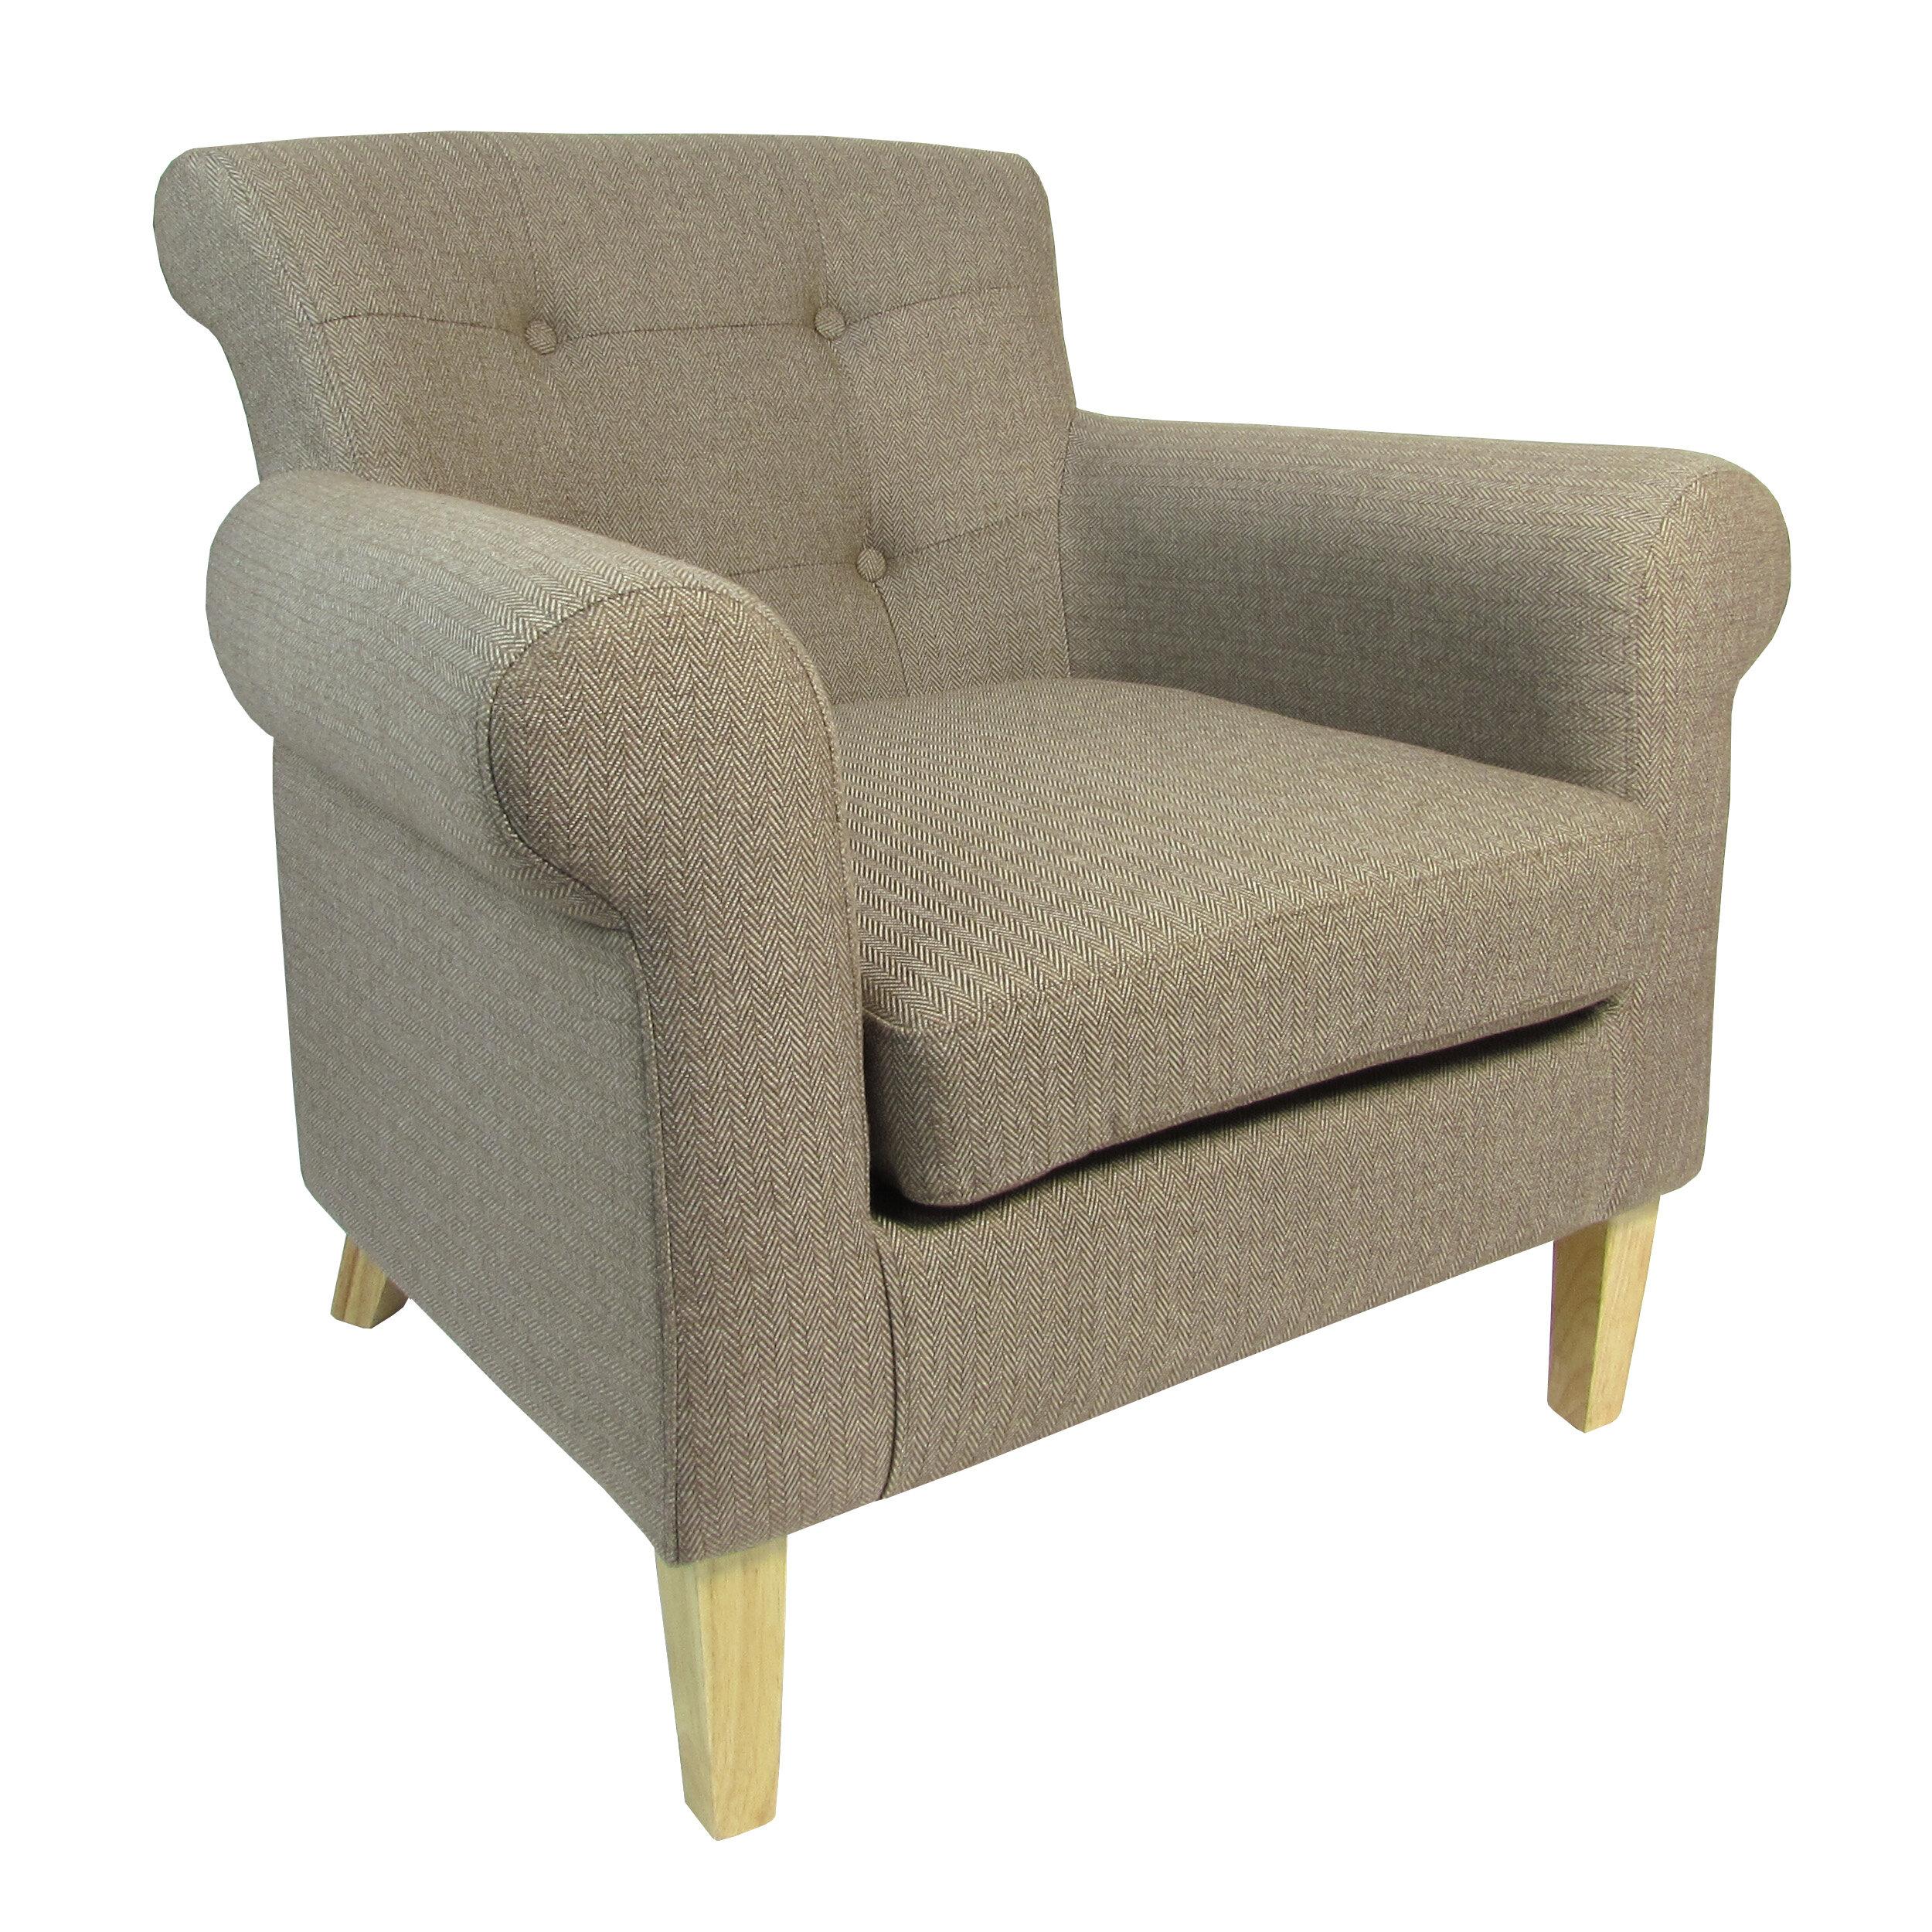 Home Loft Concept Herringbone Armchair U0026 Reviews | Wayfair.co.uk